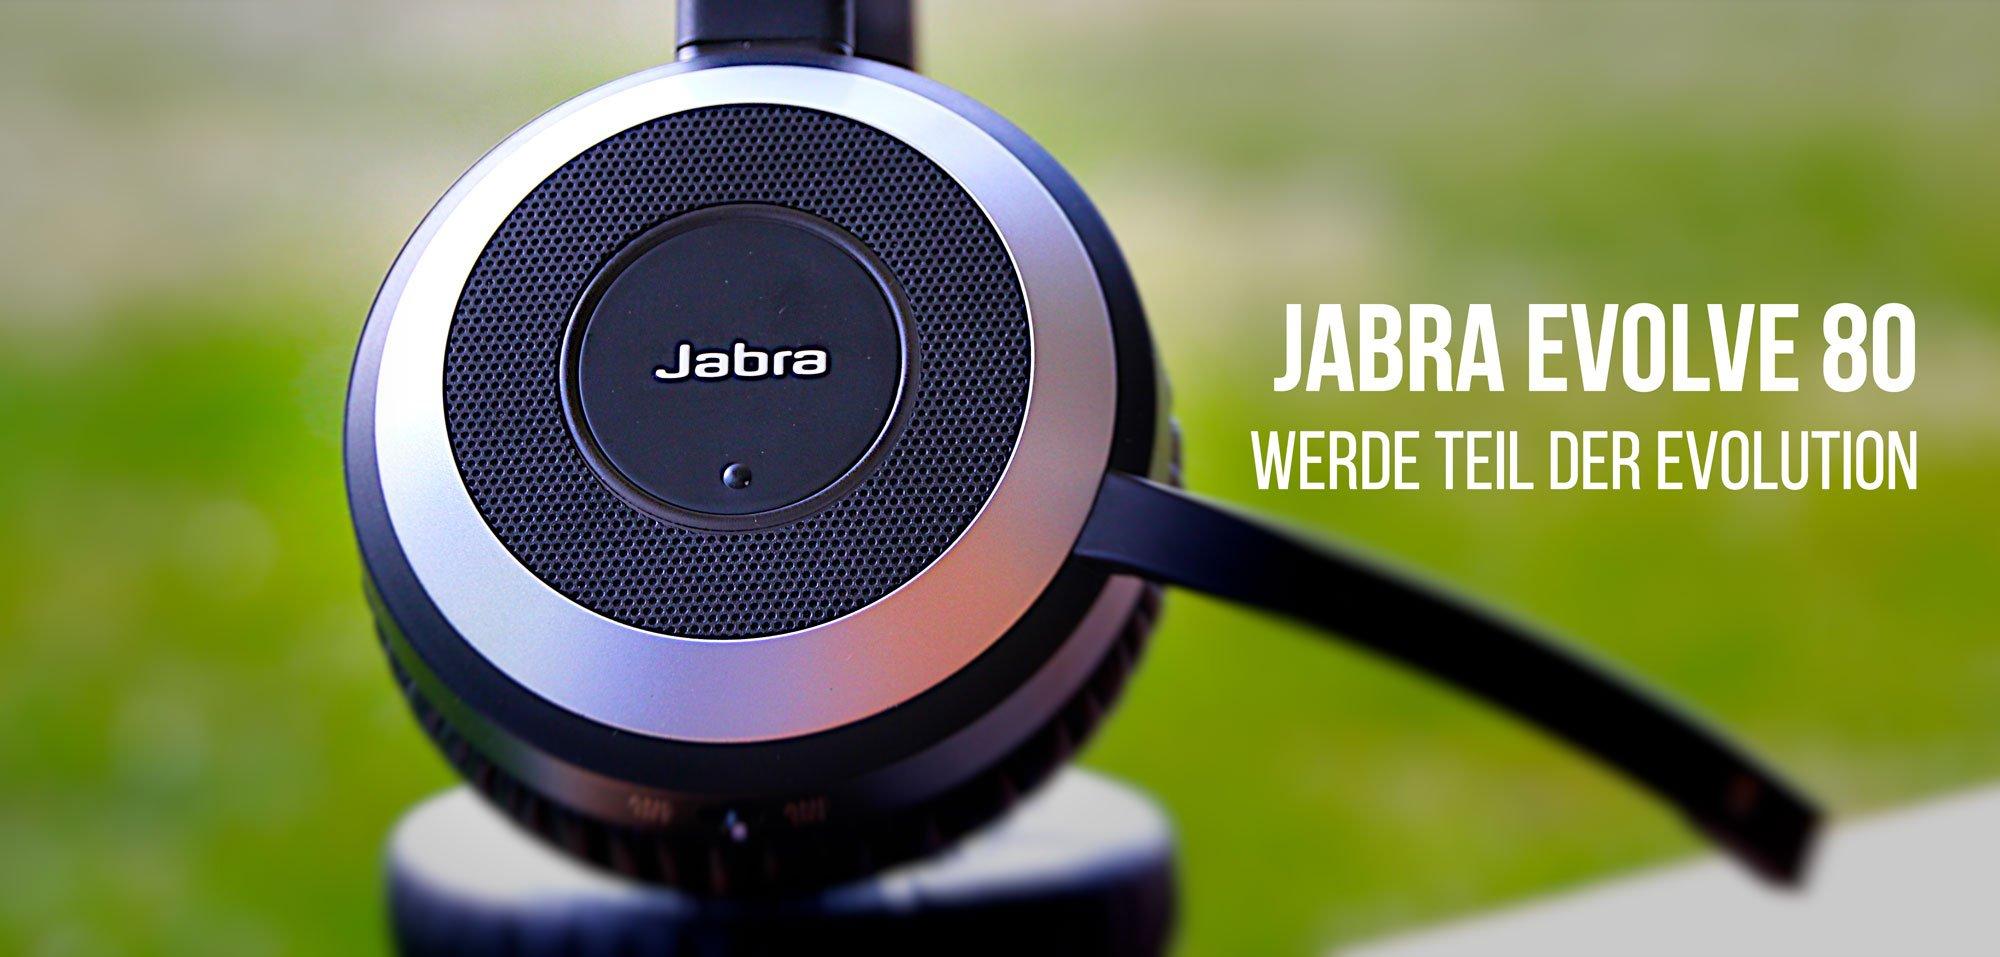 Jabra Evolve 80 Test: Profi-Headset mit Noise Cancelling 10